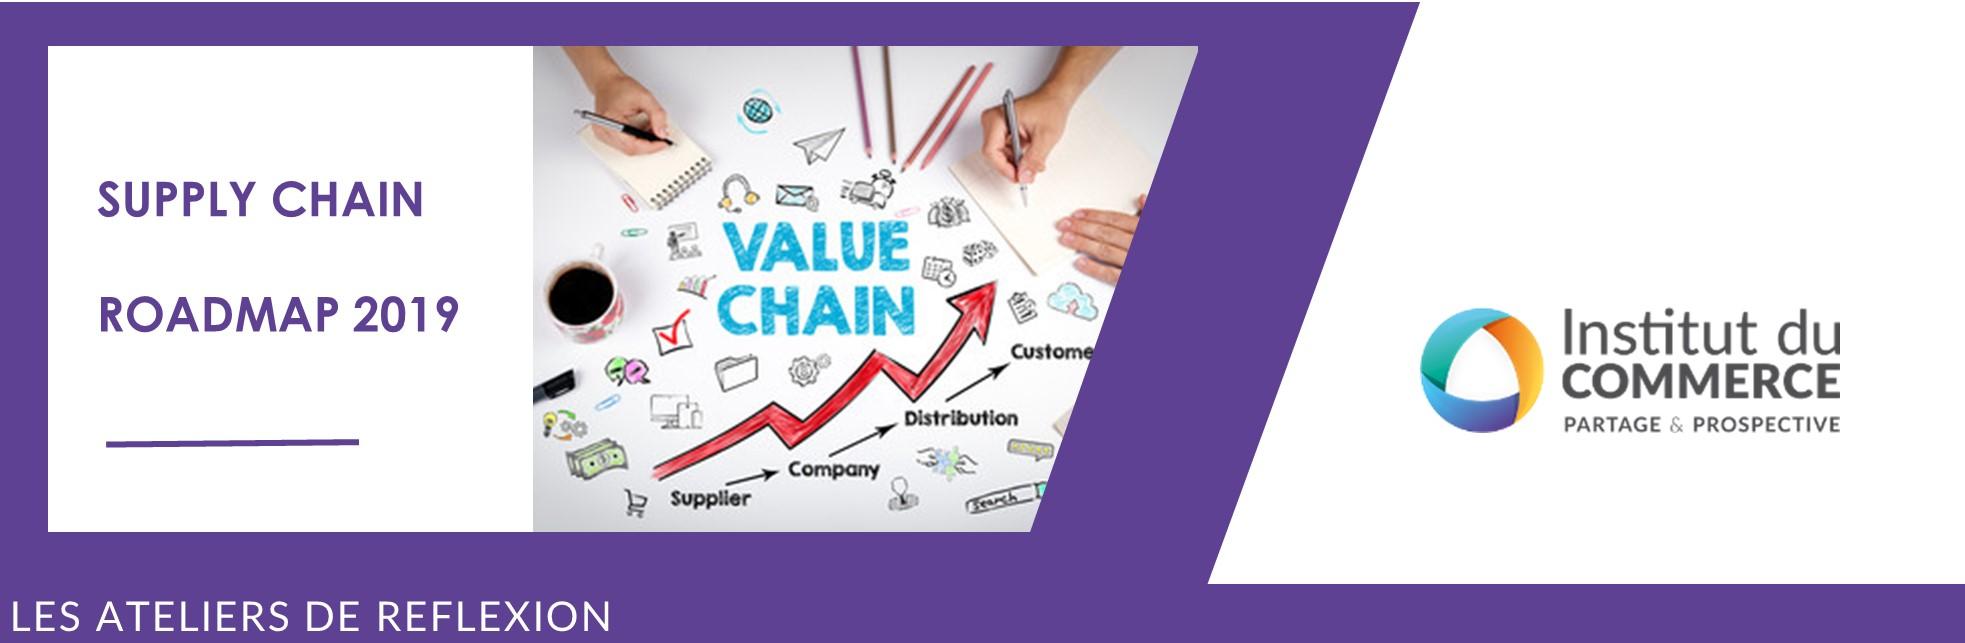 Supply Chain Roadmap 2019